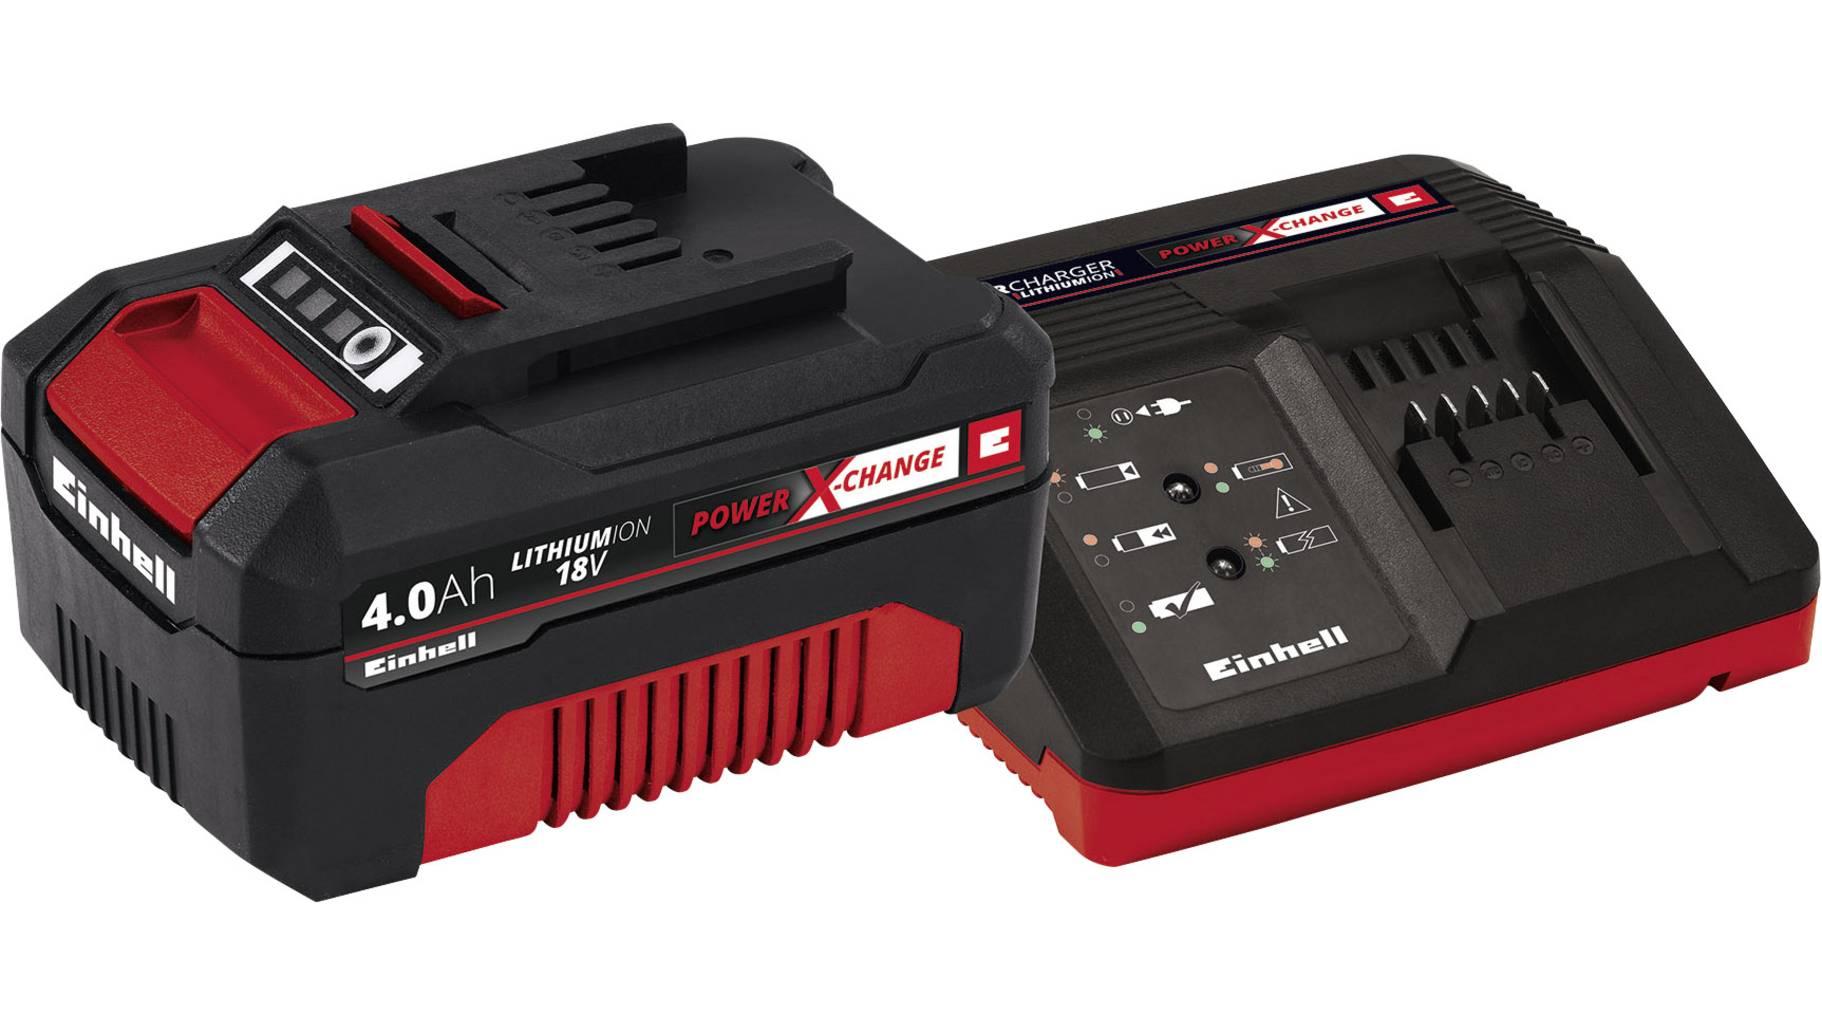 Einhell Power X-Change PXC Starter Kit 18V 4Ah 4512042 Werkzeug-Akku und Ladegerät 18 V 4 Ah Li-Ion